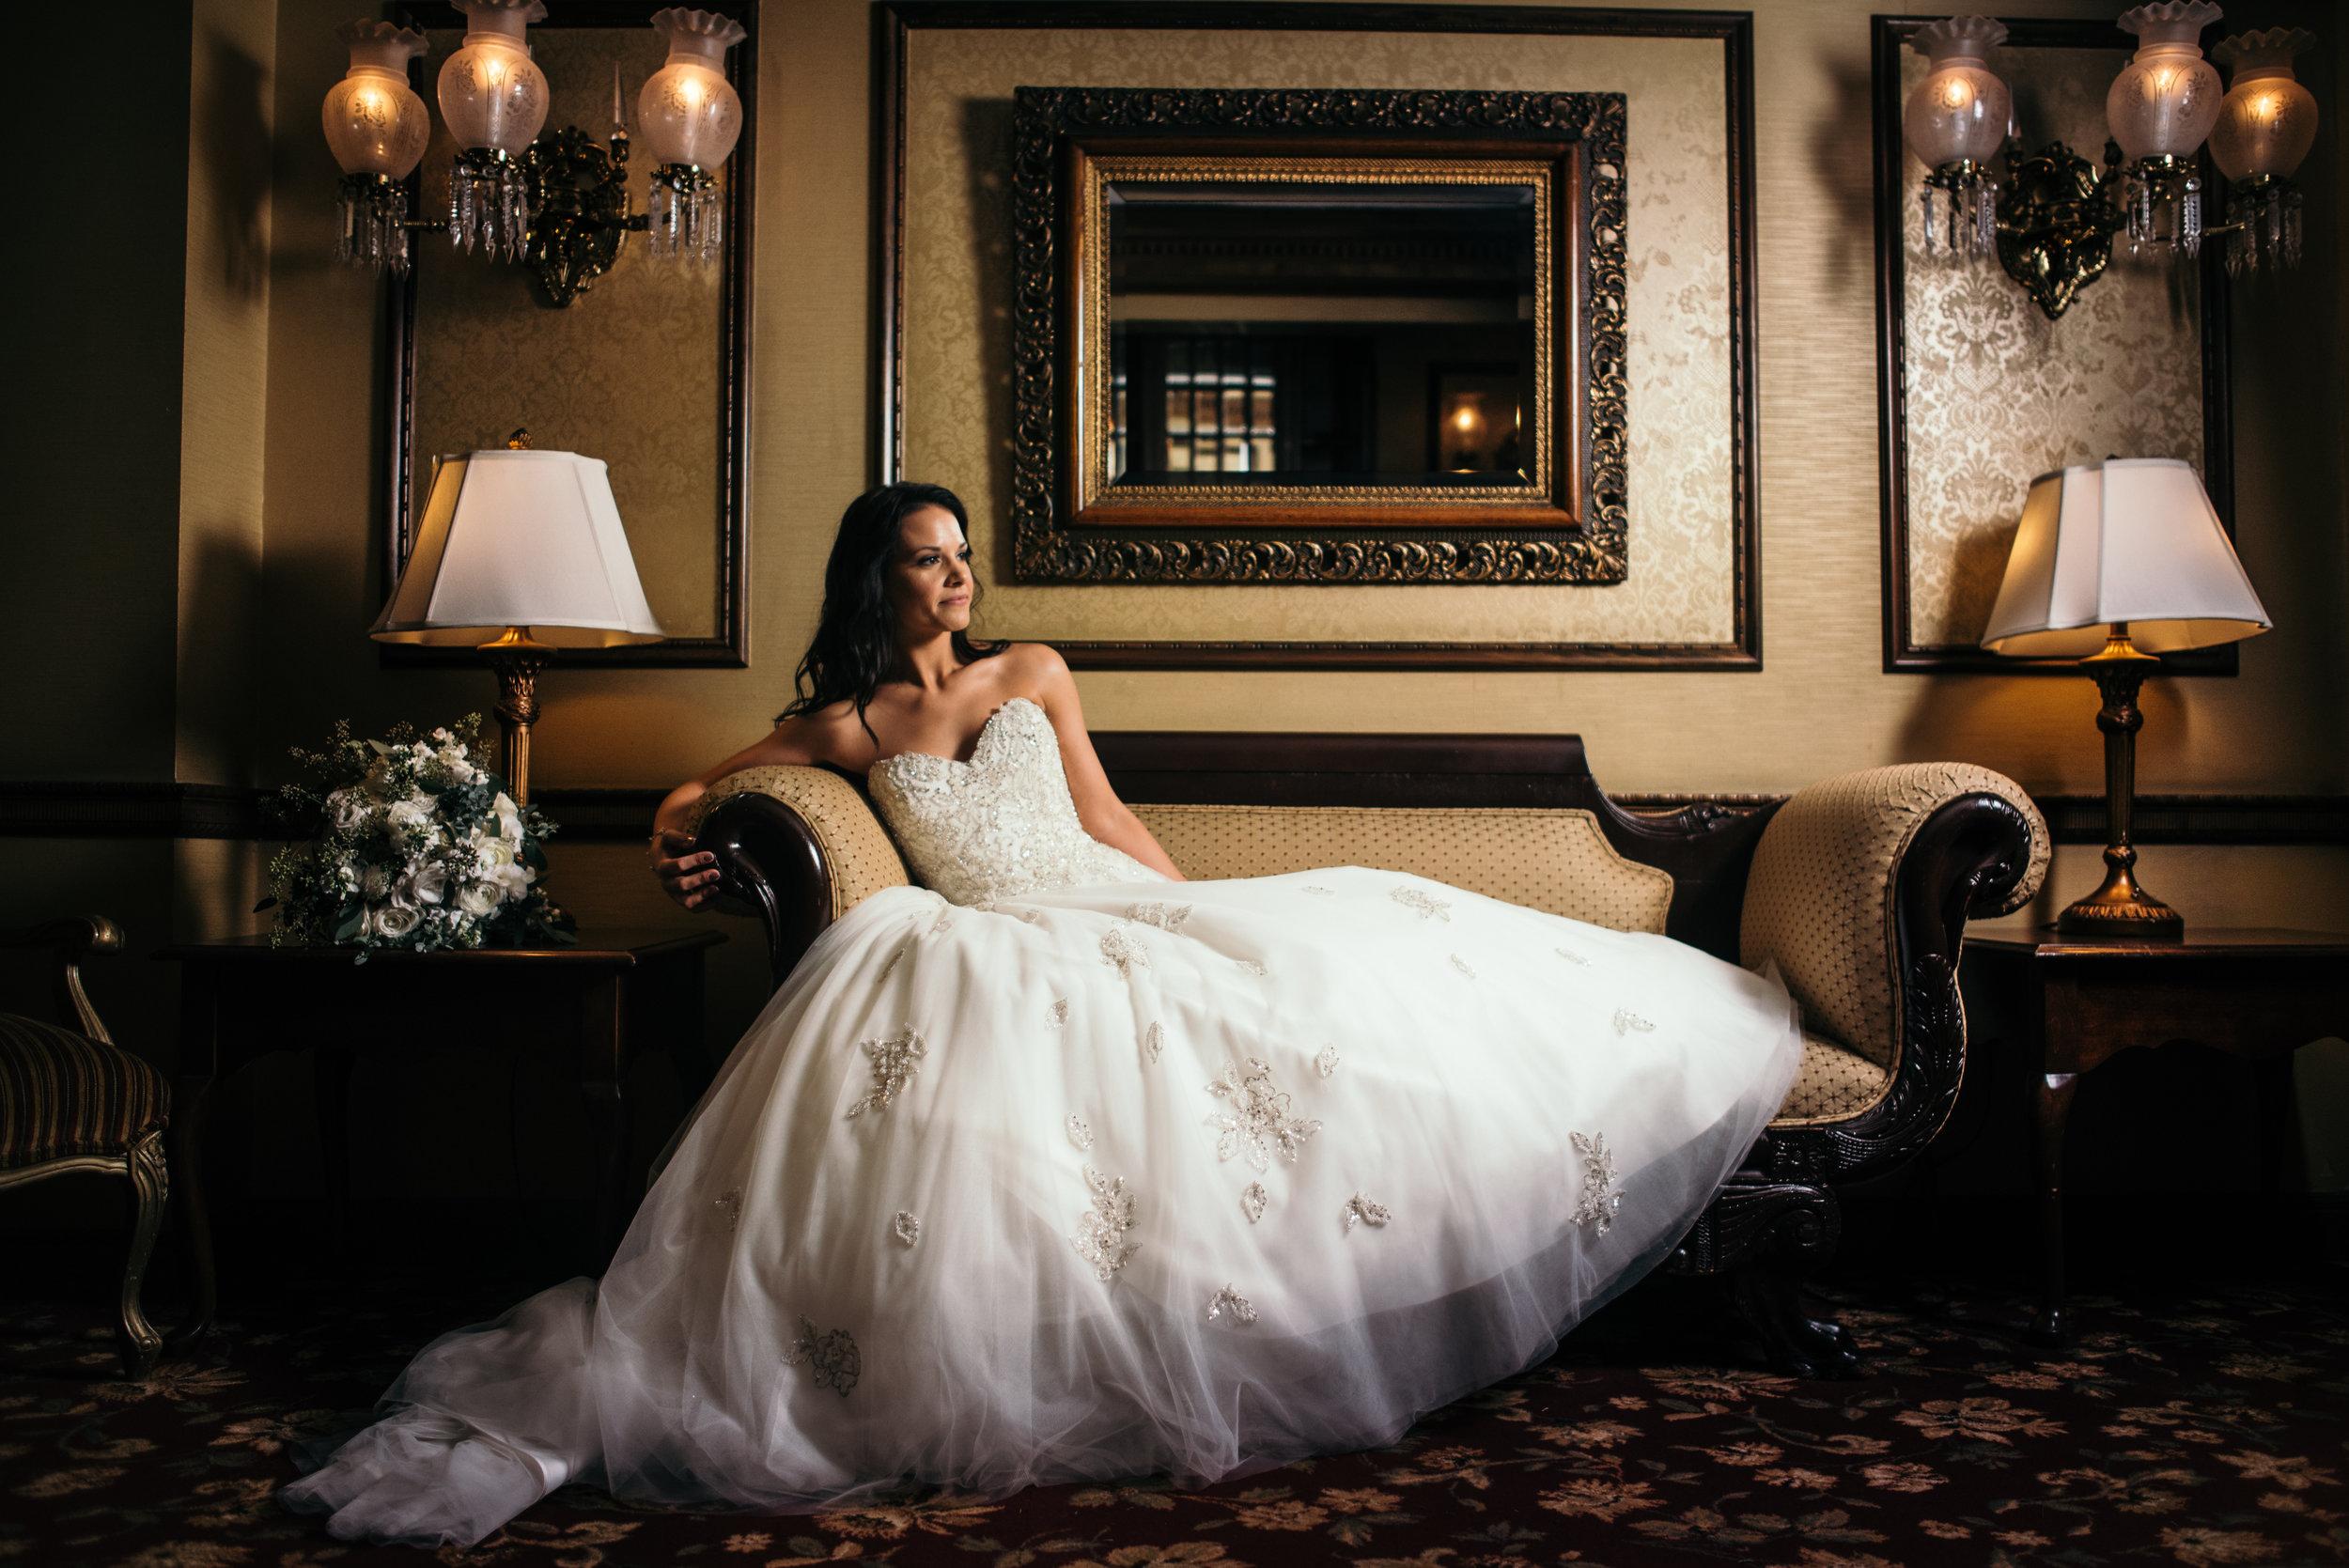 WeddingPhotos | NJPhotographer | Highlights-4-32.jpg